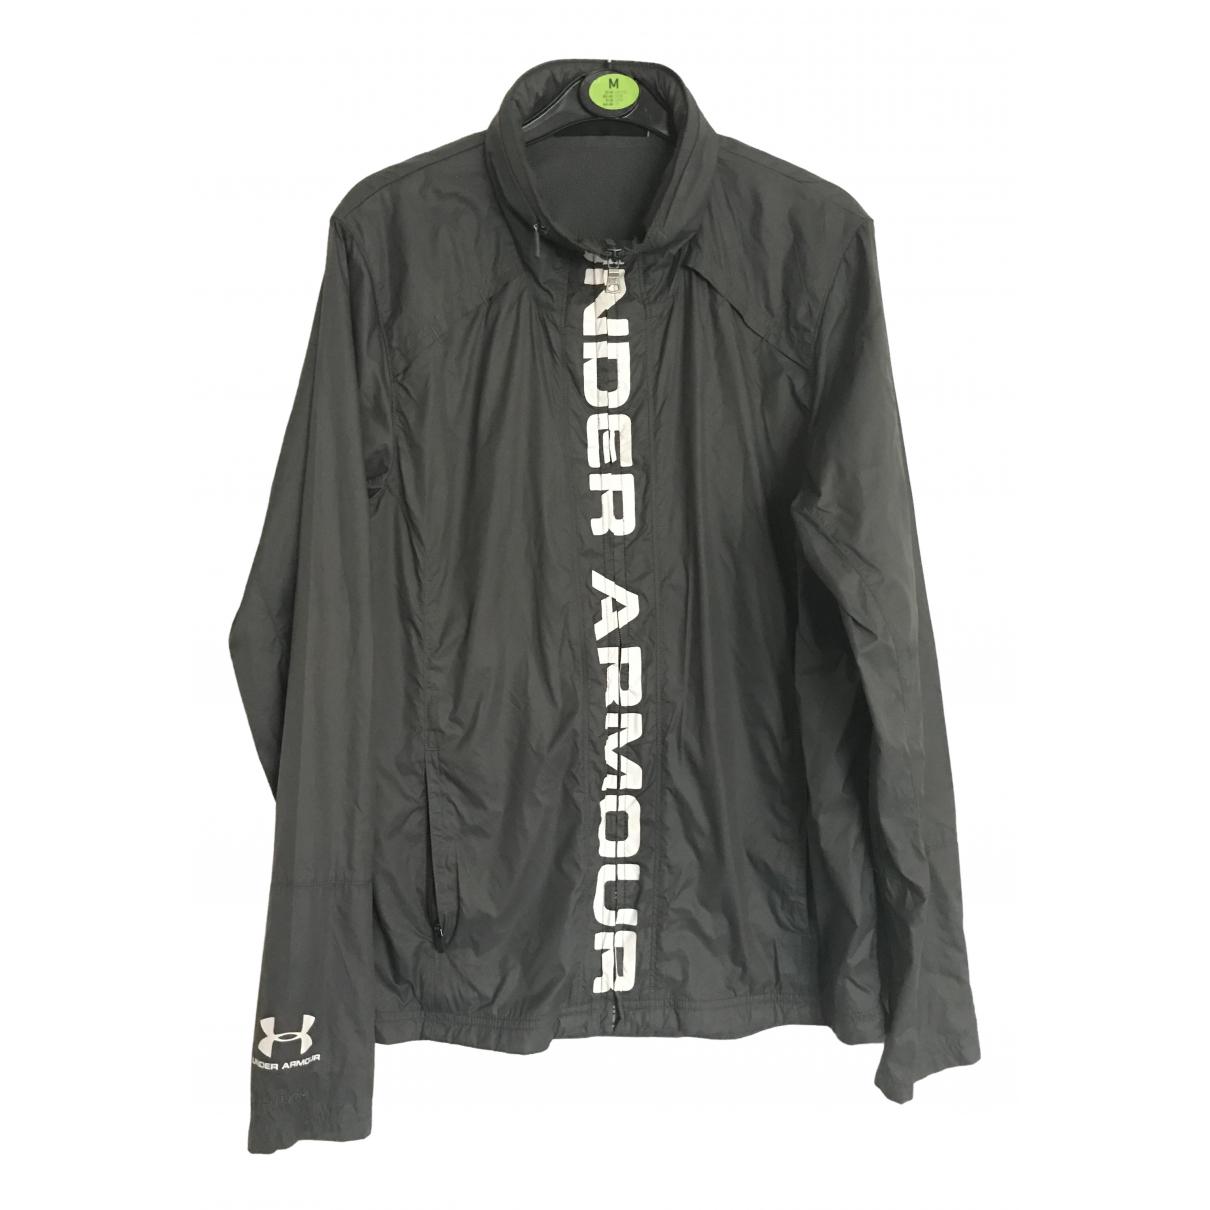 Under Armour \N Grey jacket  for Men S International